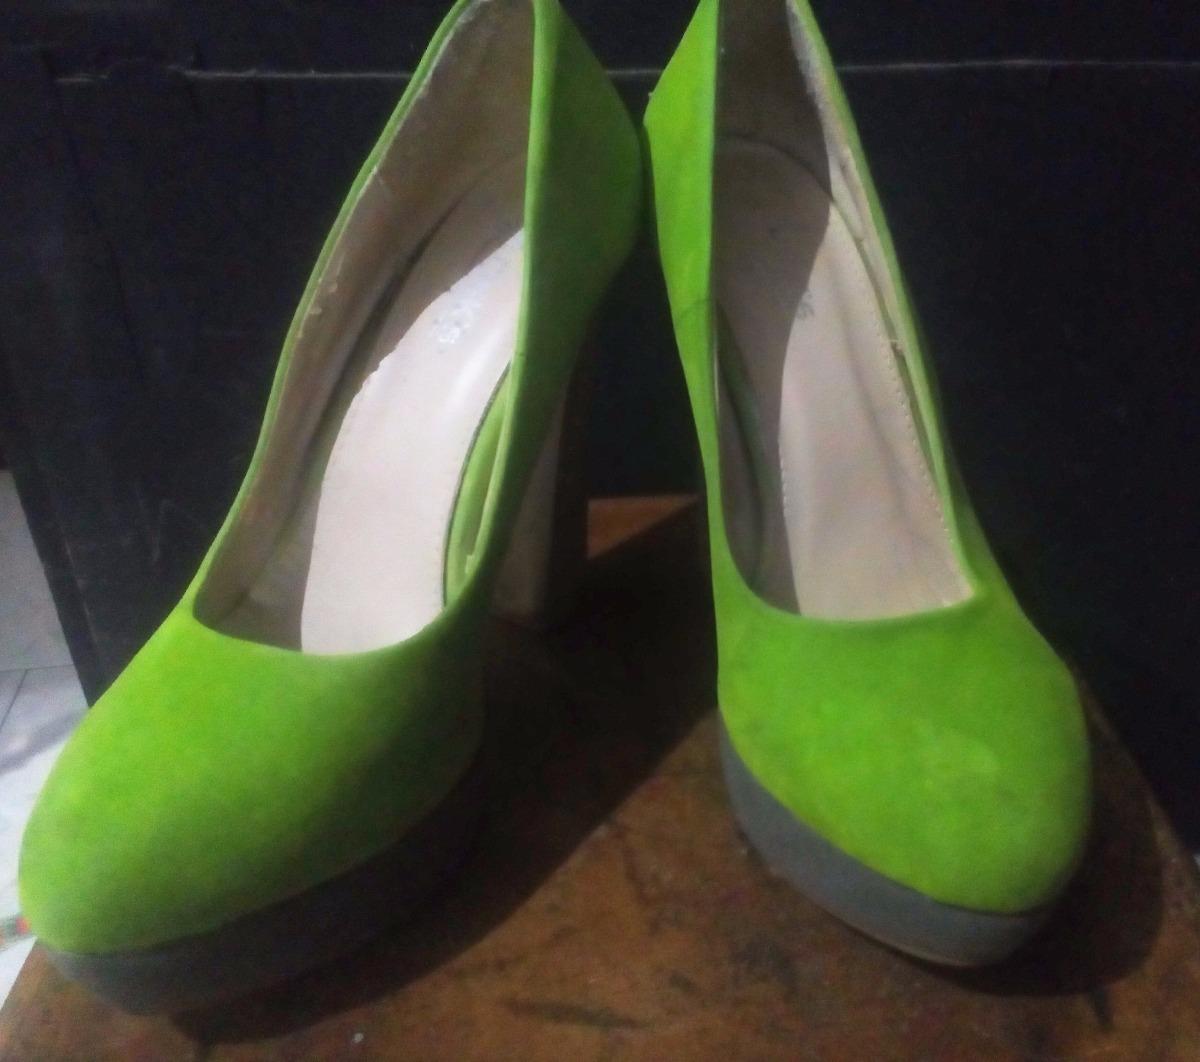 bastante agradable 36874 9d489 Zapatos Tacones Verdes 37 Plataforma - Bs. 15.000,00